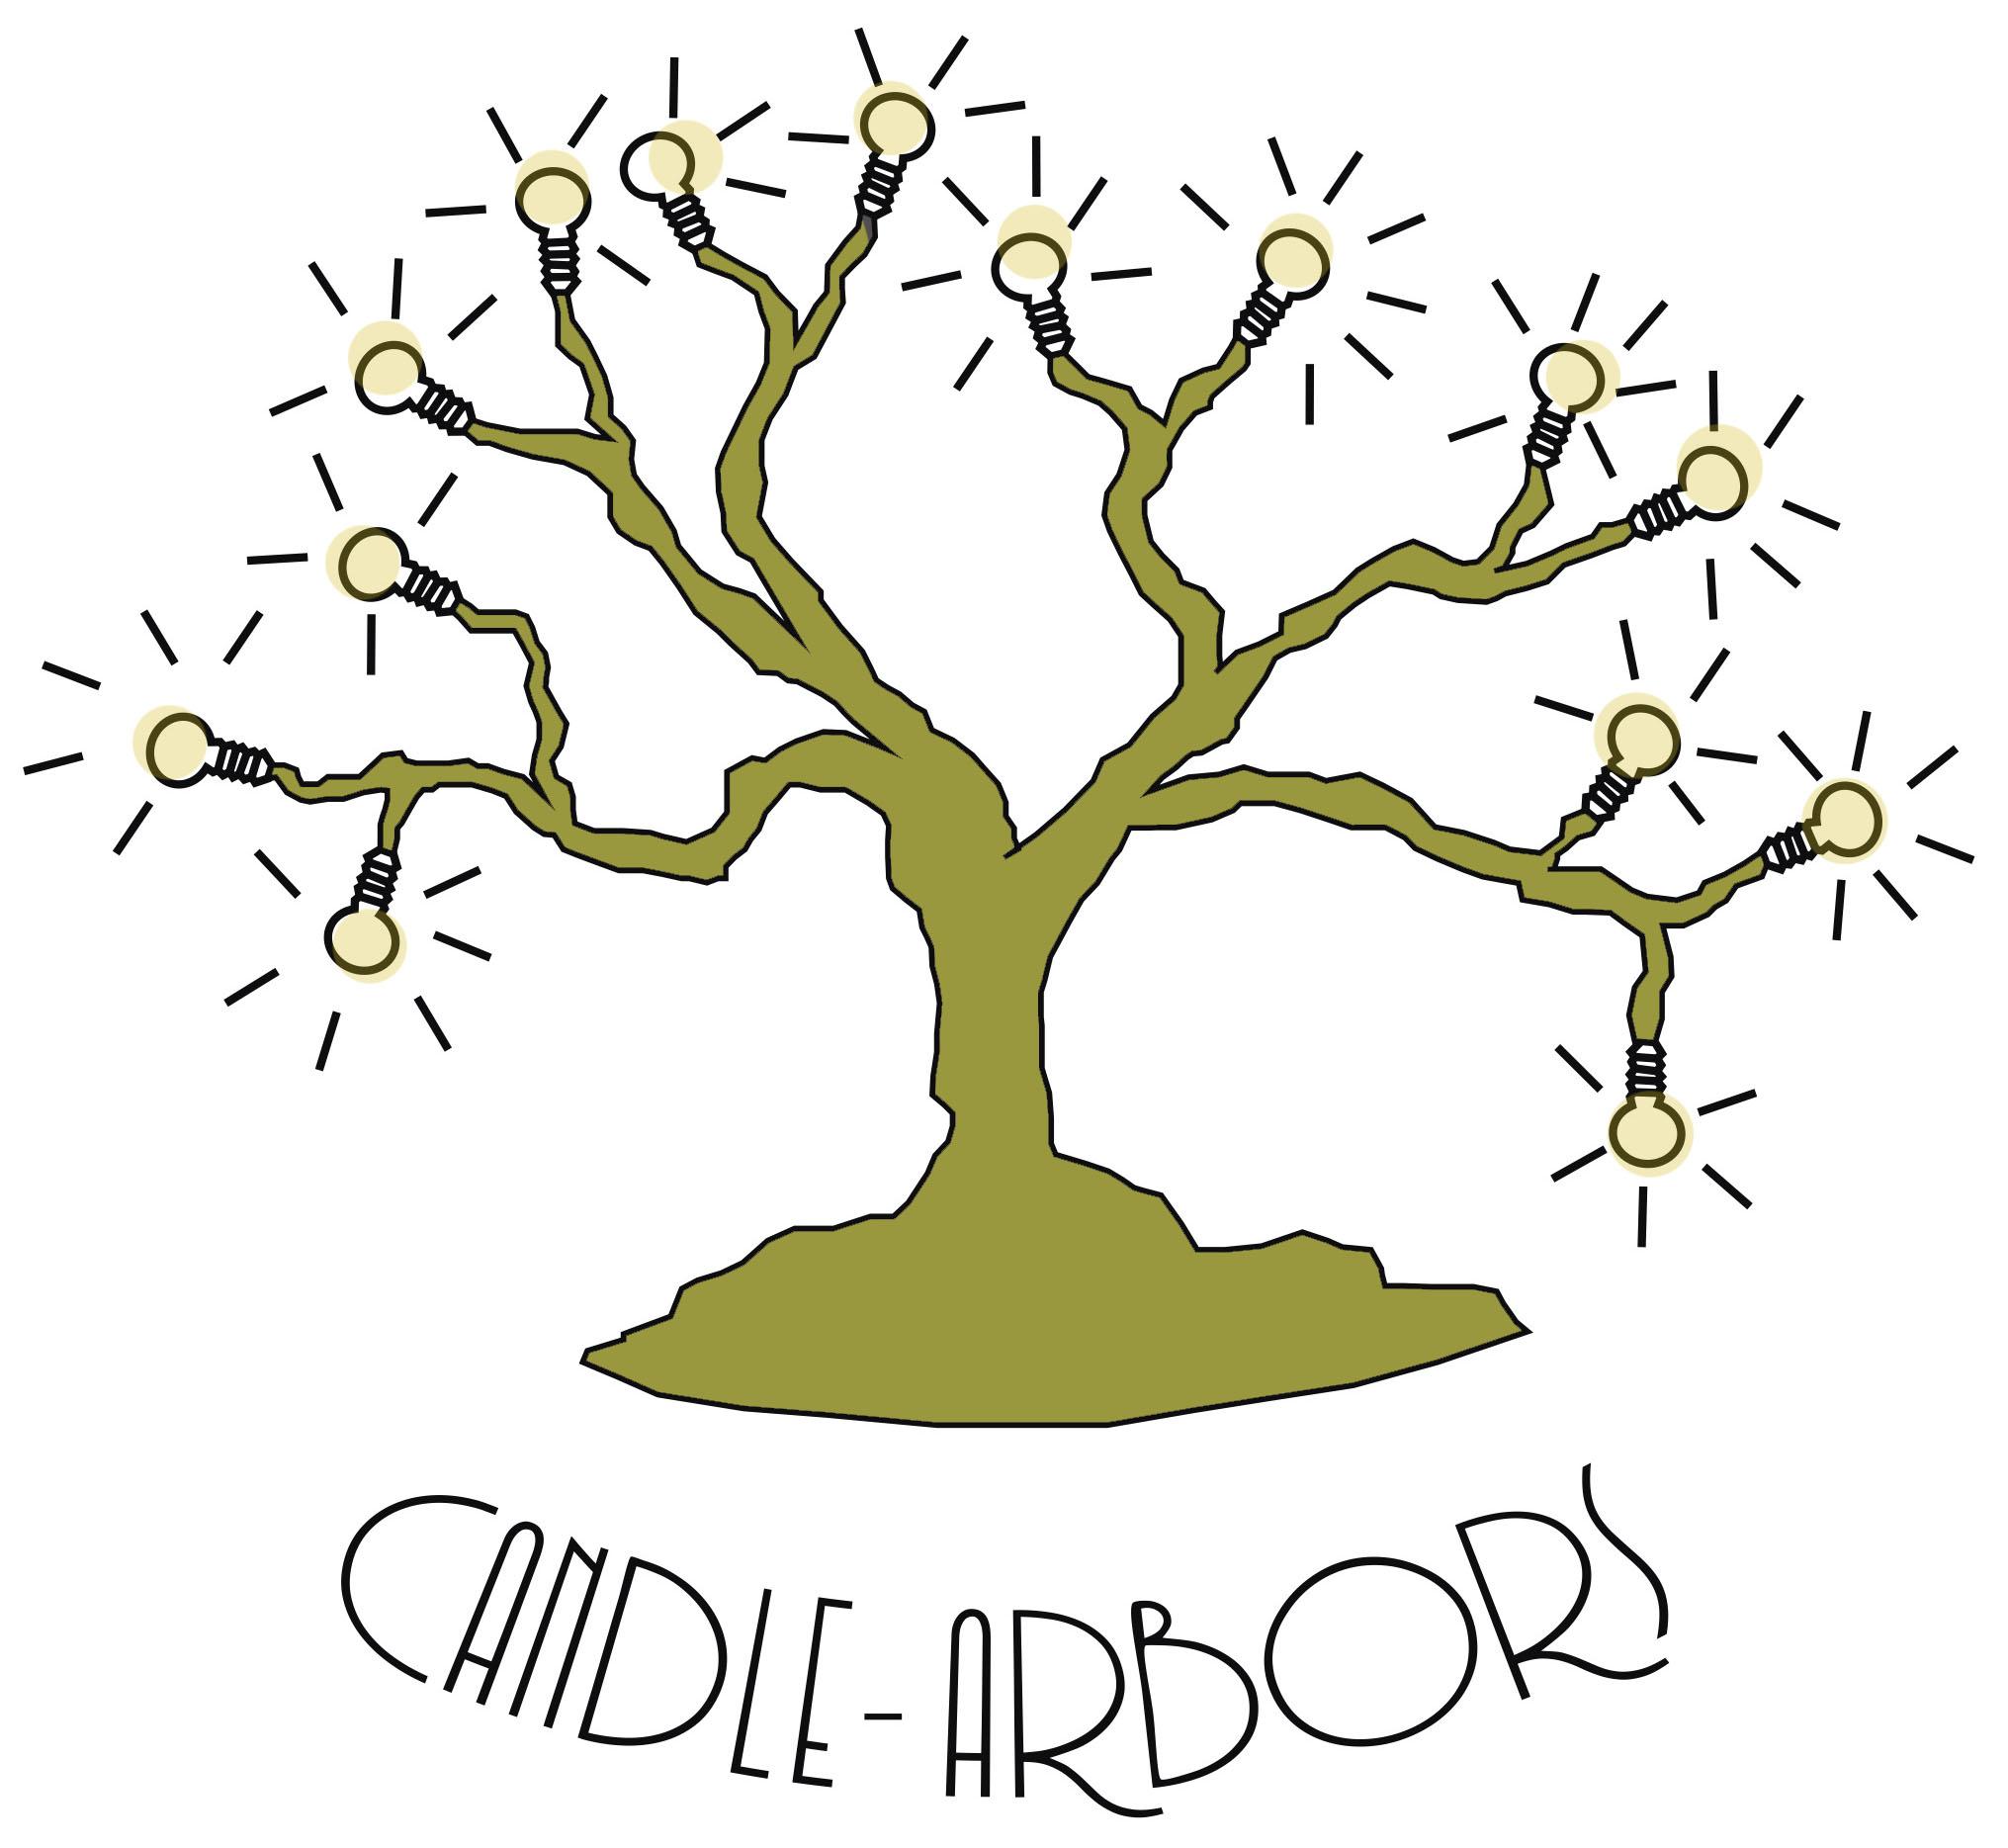 candlearbors logo.jpg